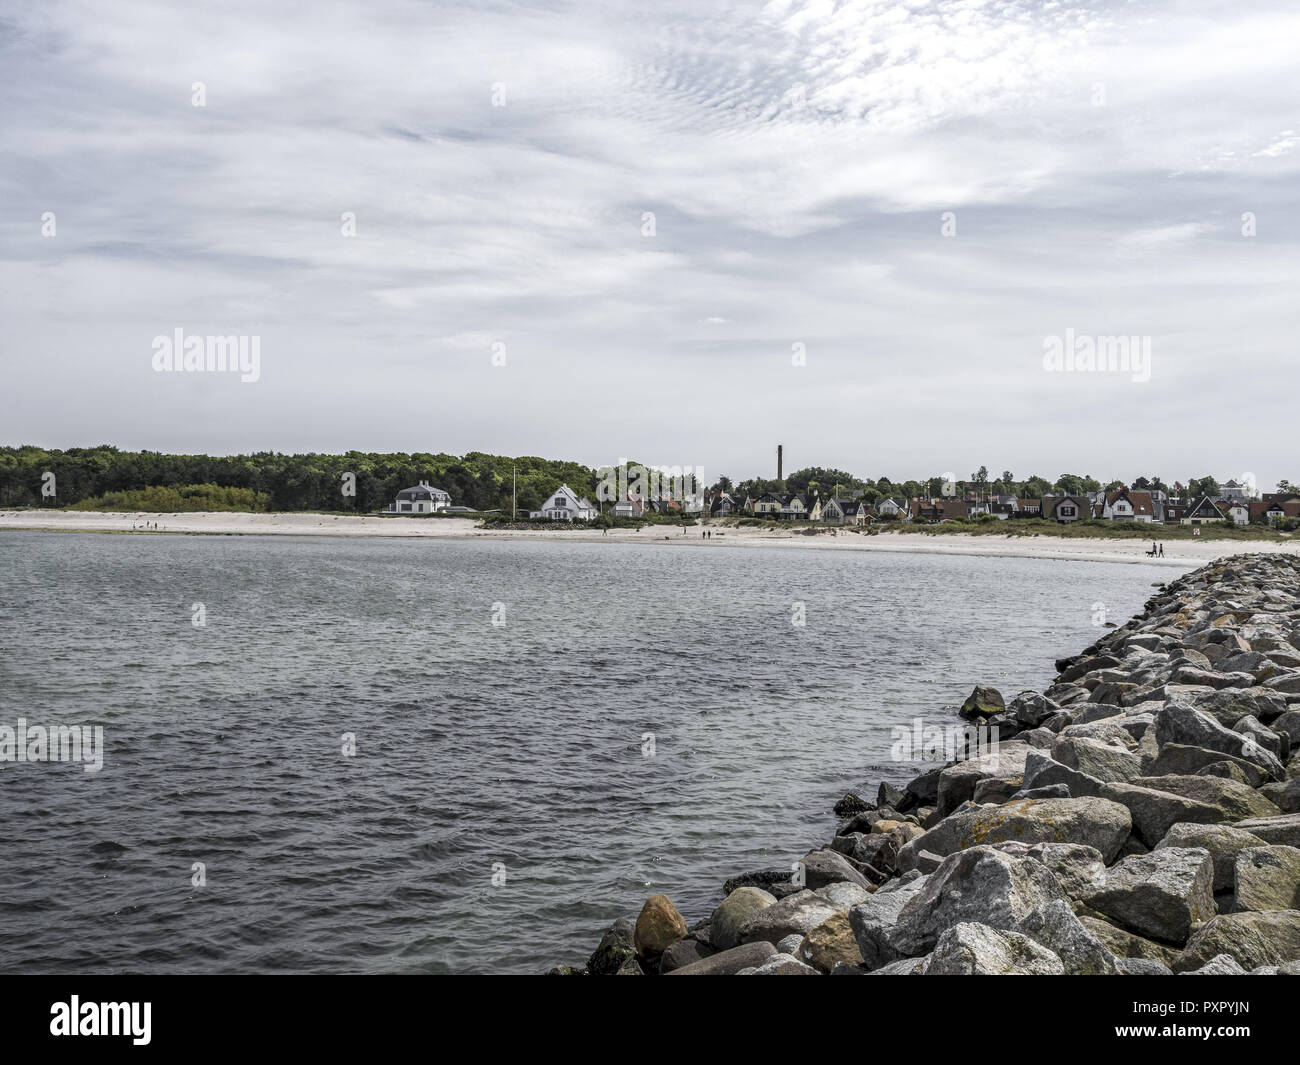 Hornbaek Beach, North Zealand, Denmark, Scandinavia - Stock Image